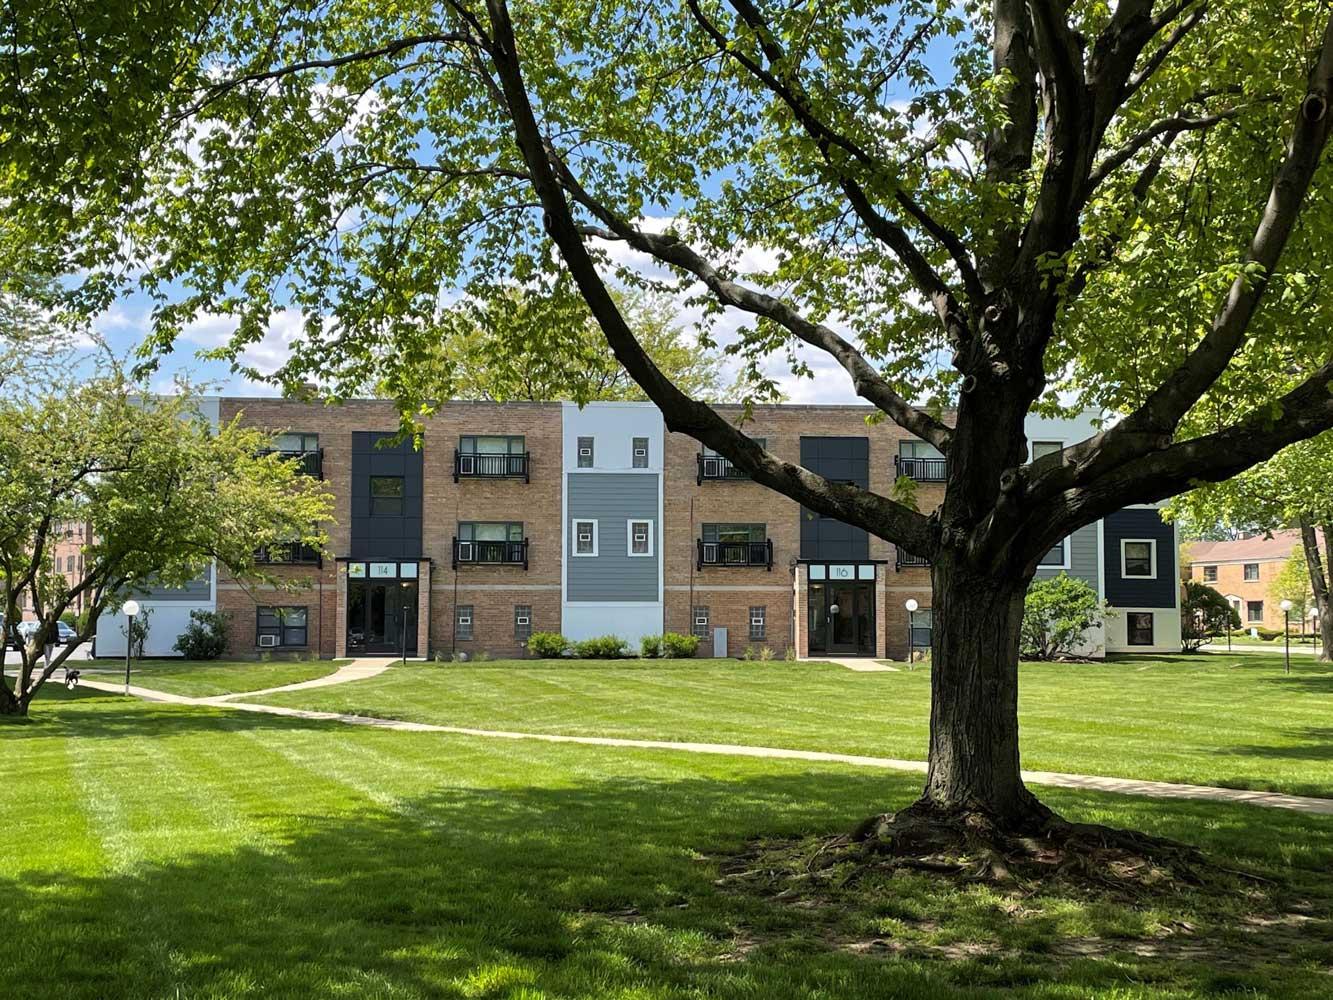 Courtyard at Elmhurst Terrace Apartments in Elmhurst, Illinois